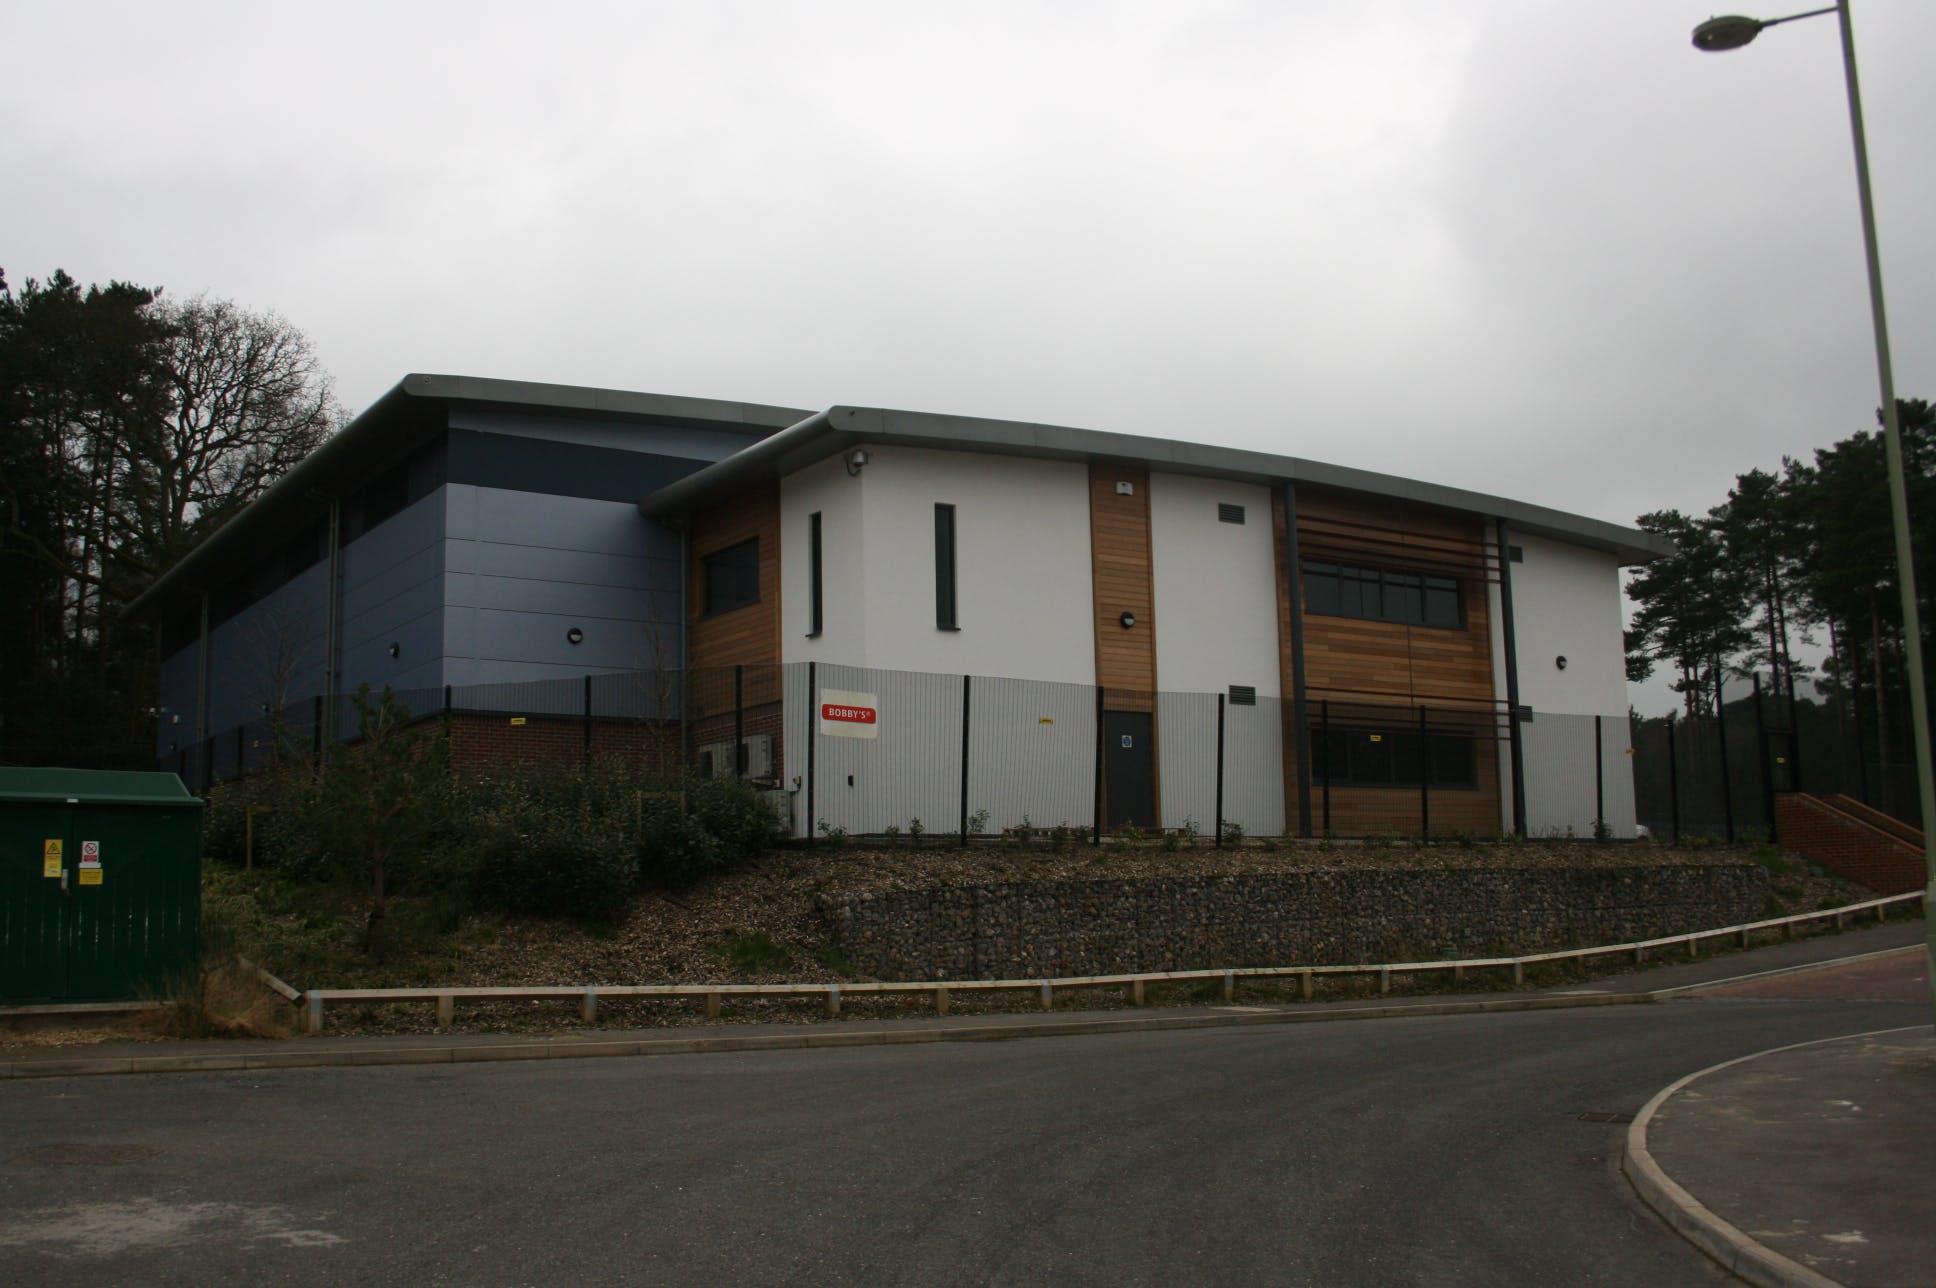 Viking Park, Petersfield Road, Bordon, Open Storage Land / Development (Land & Buildings) For Sale - Bobbys Foods